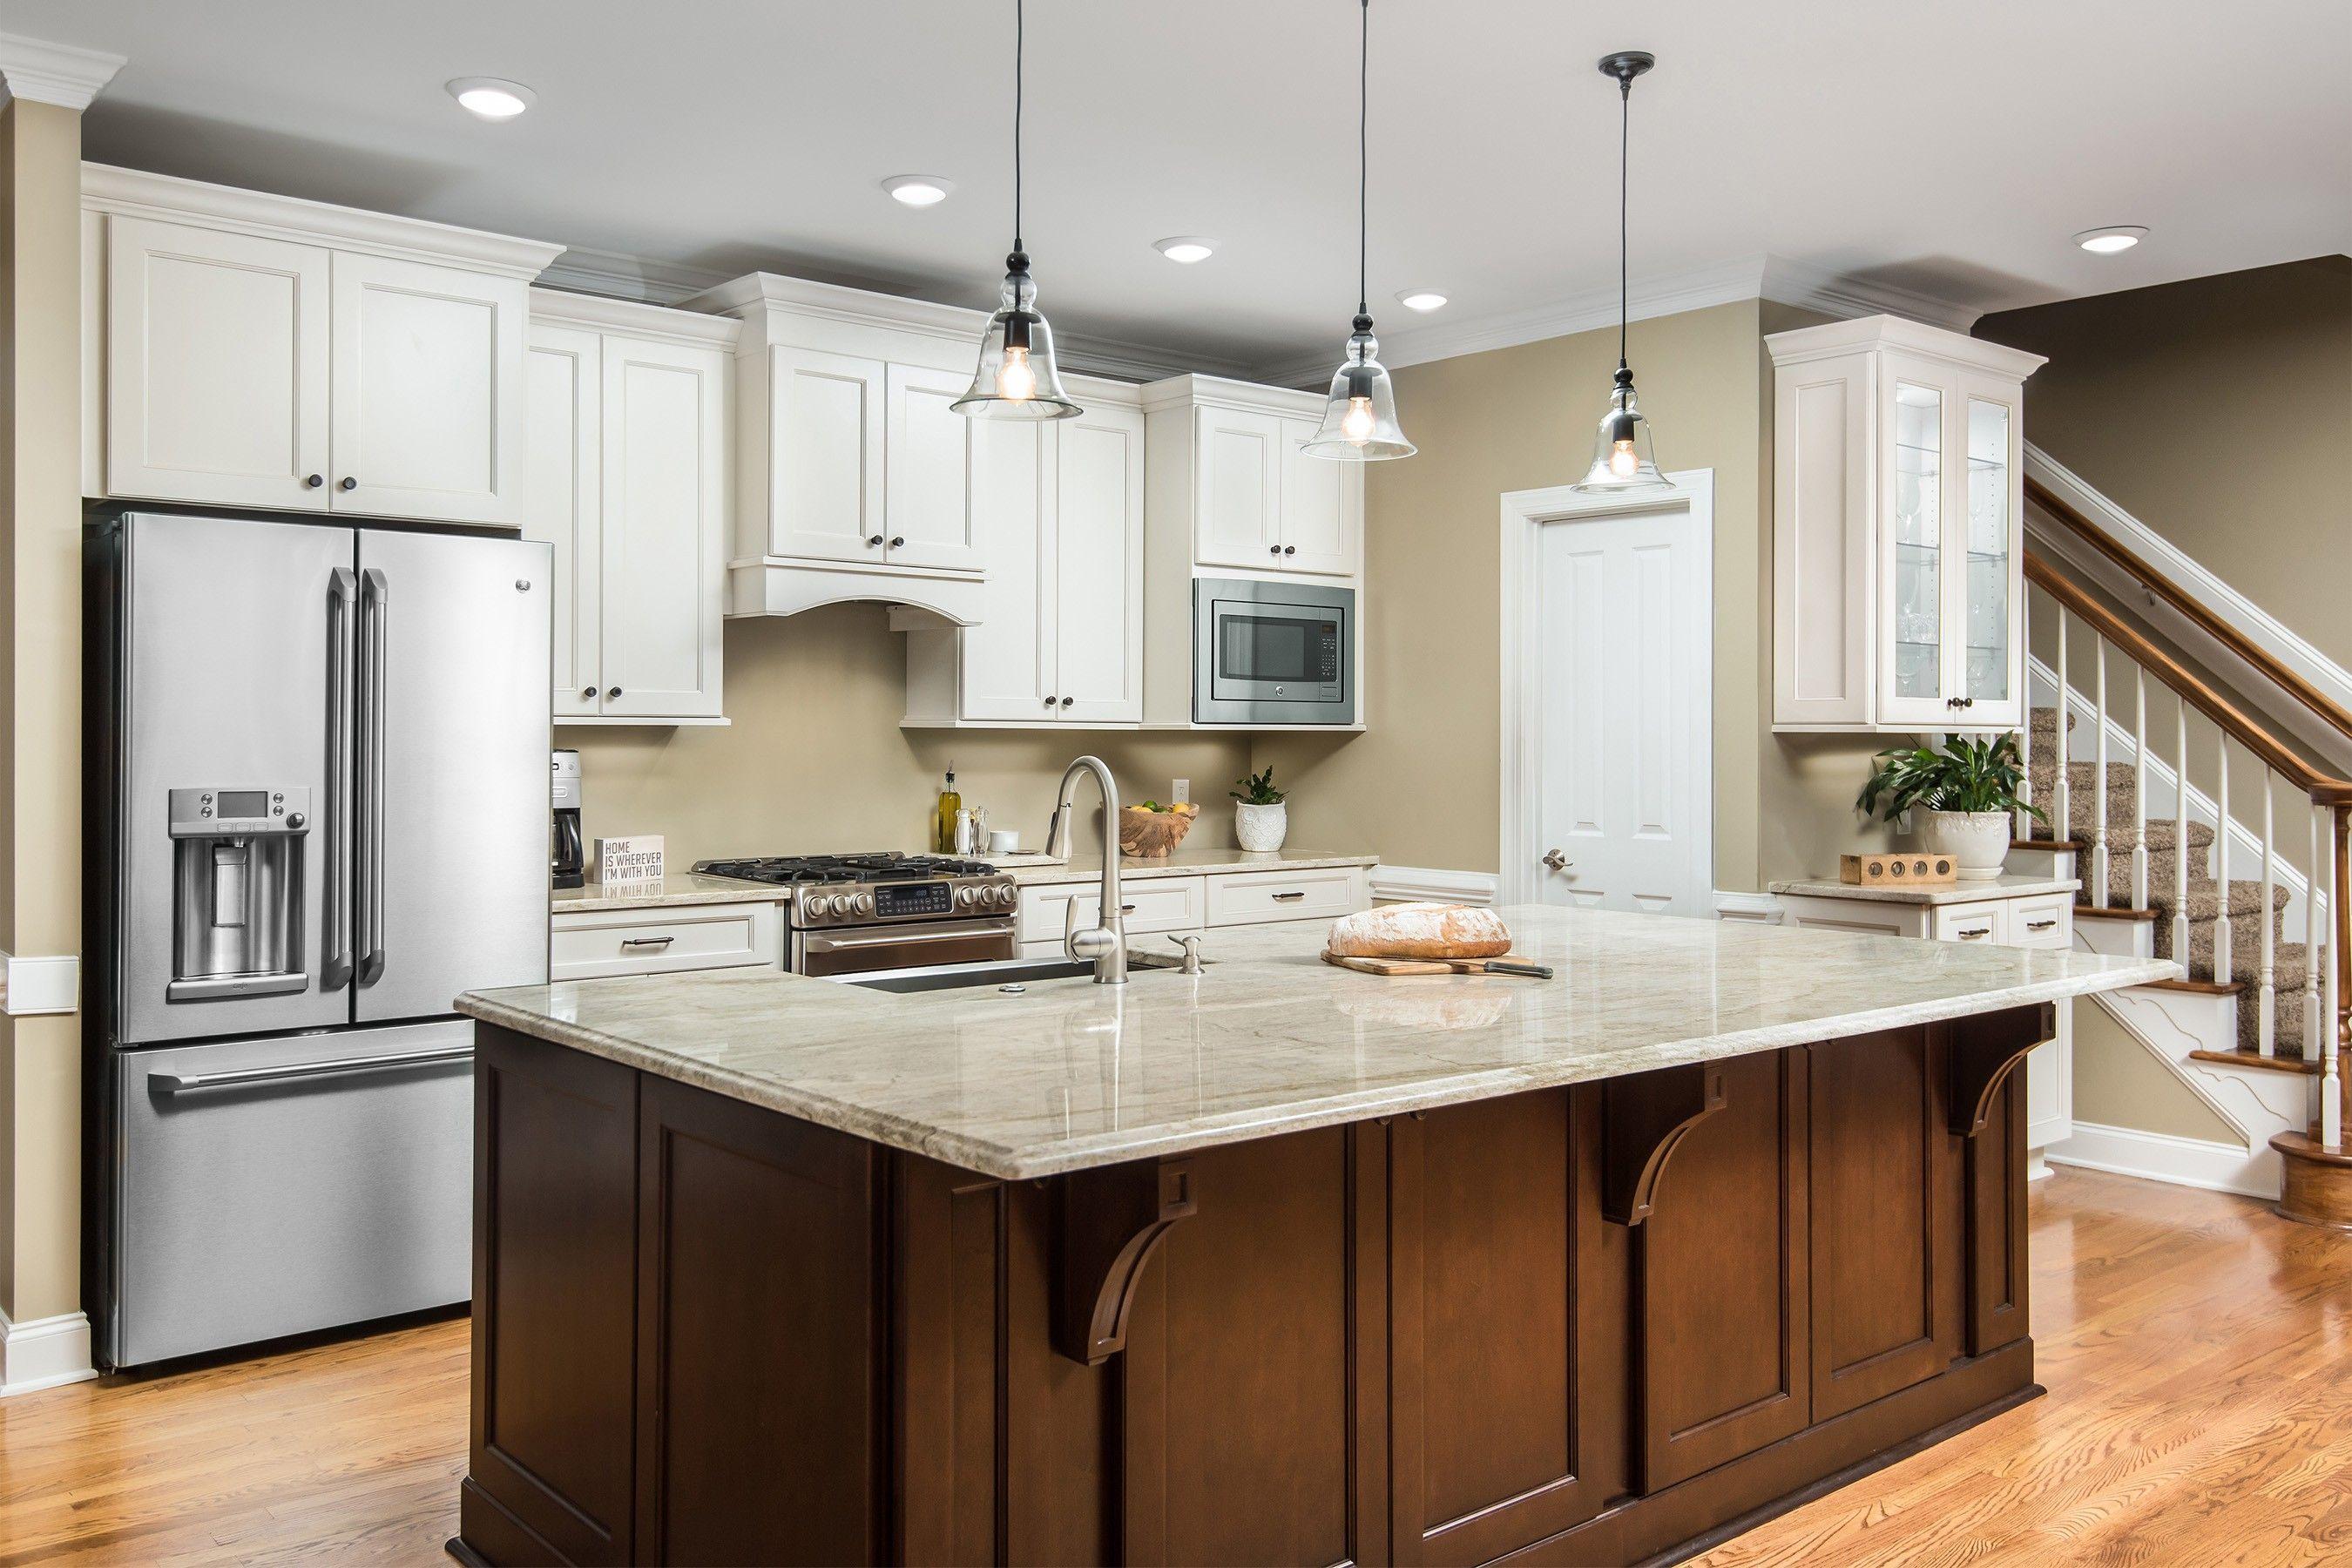 Impressive One Wall Kitchen Ideas With Island, A kitchen